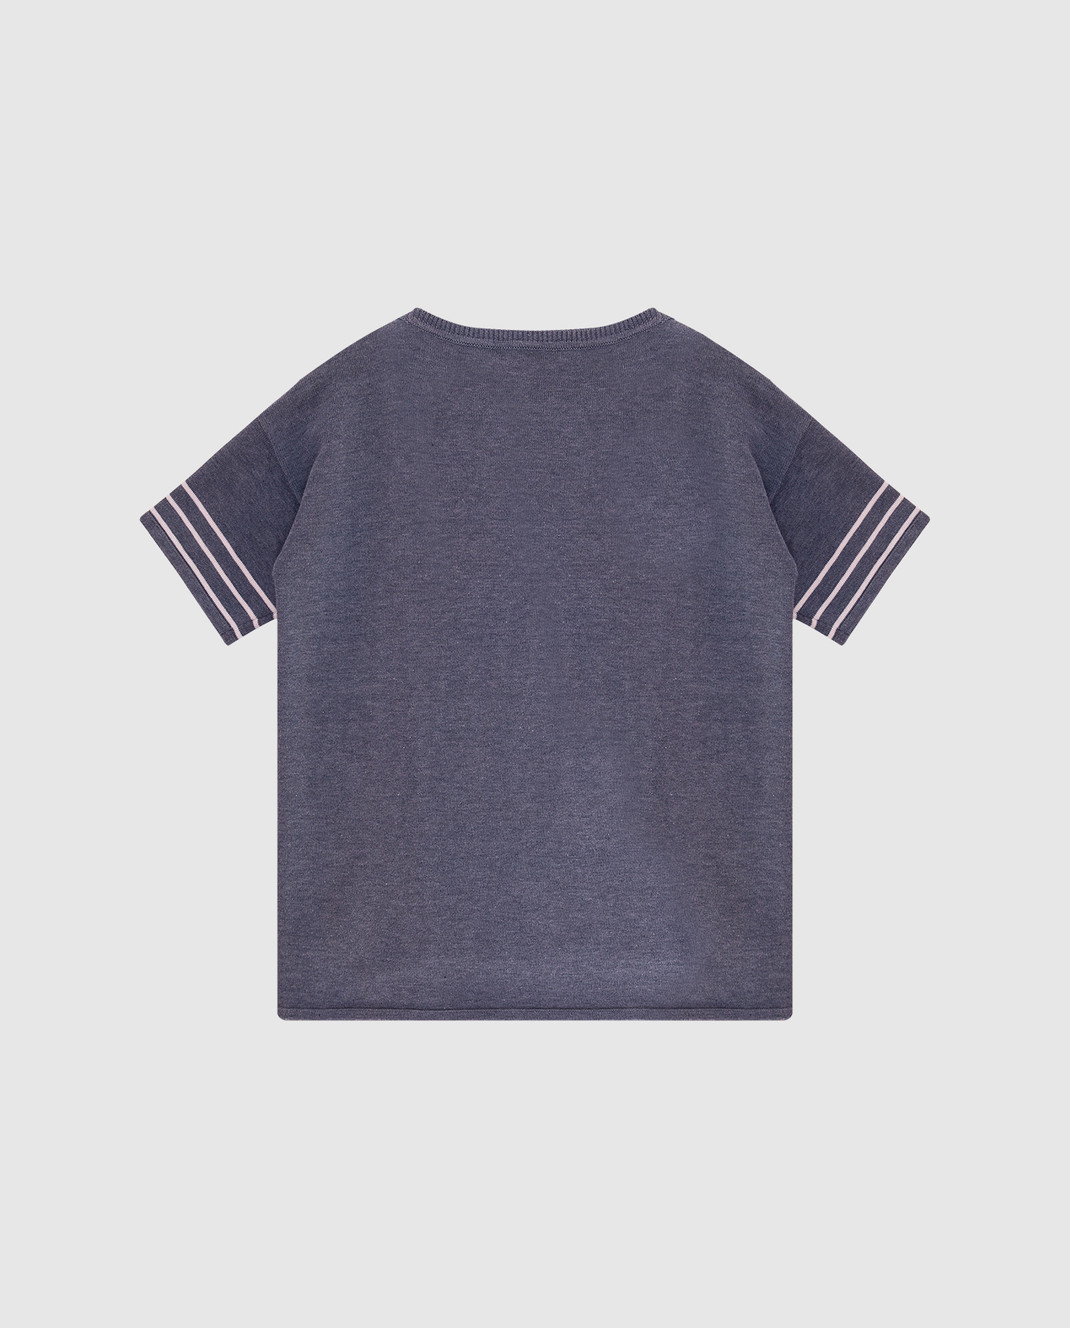 Loro Piana Детская серая футболка F2FAI0602 изображение 2